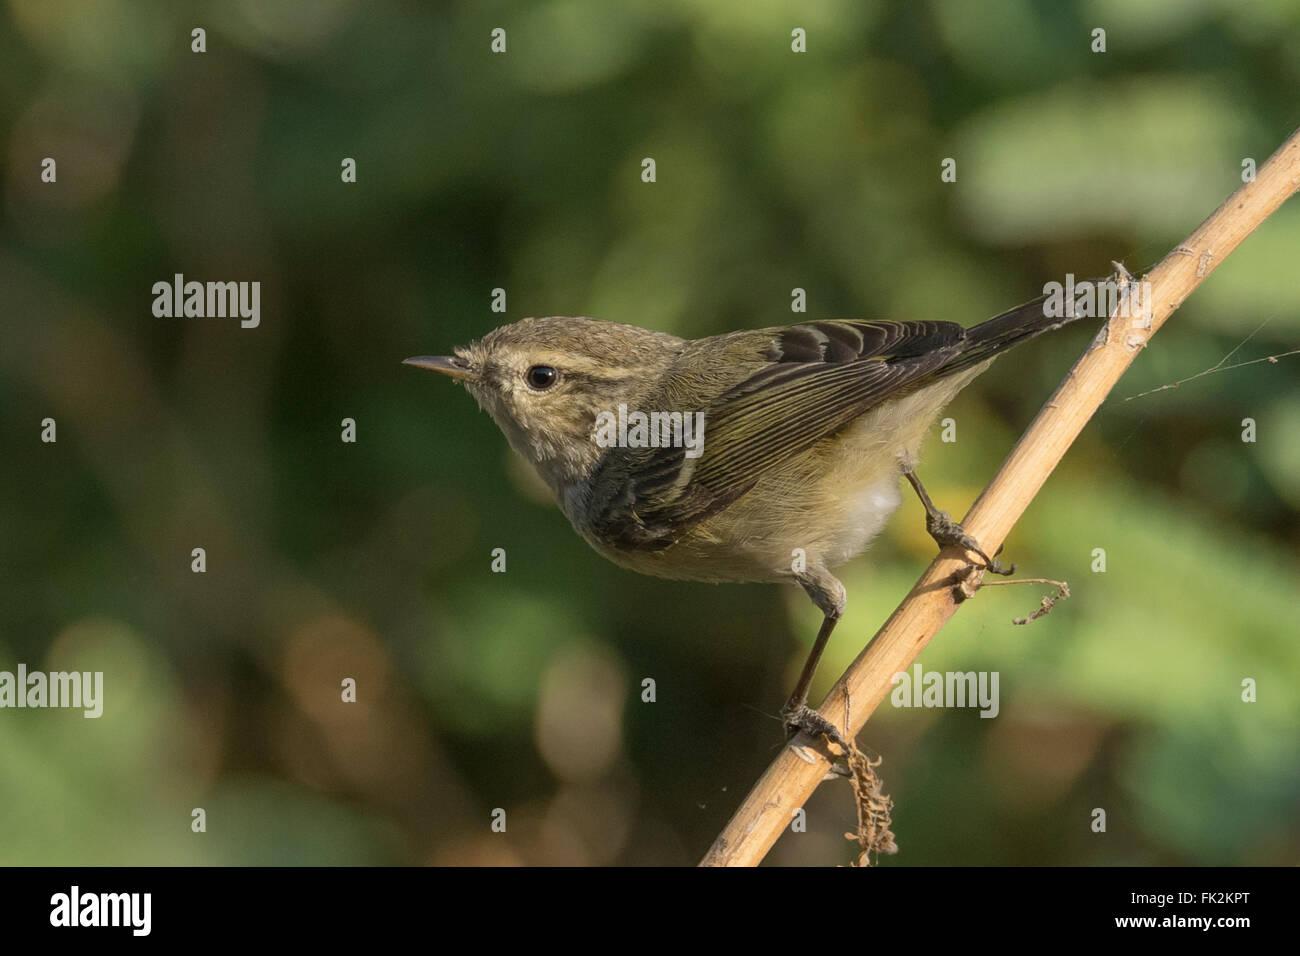 Hume's leaf warbler (Phylloscopus humei) at Thol Bird Sanctuary, Gujarat, India Stock Photo